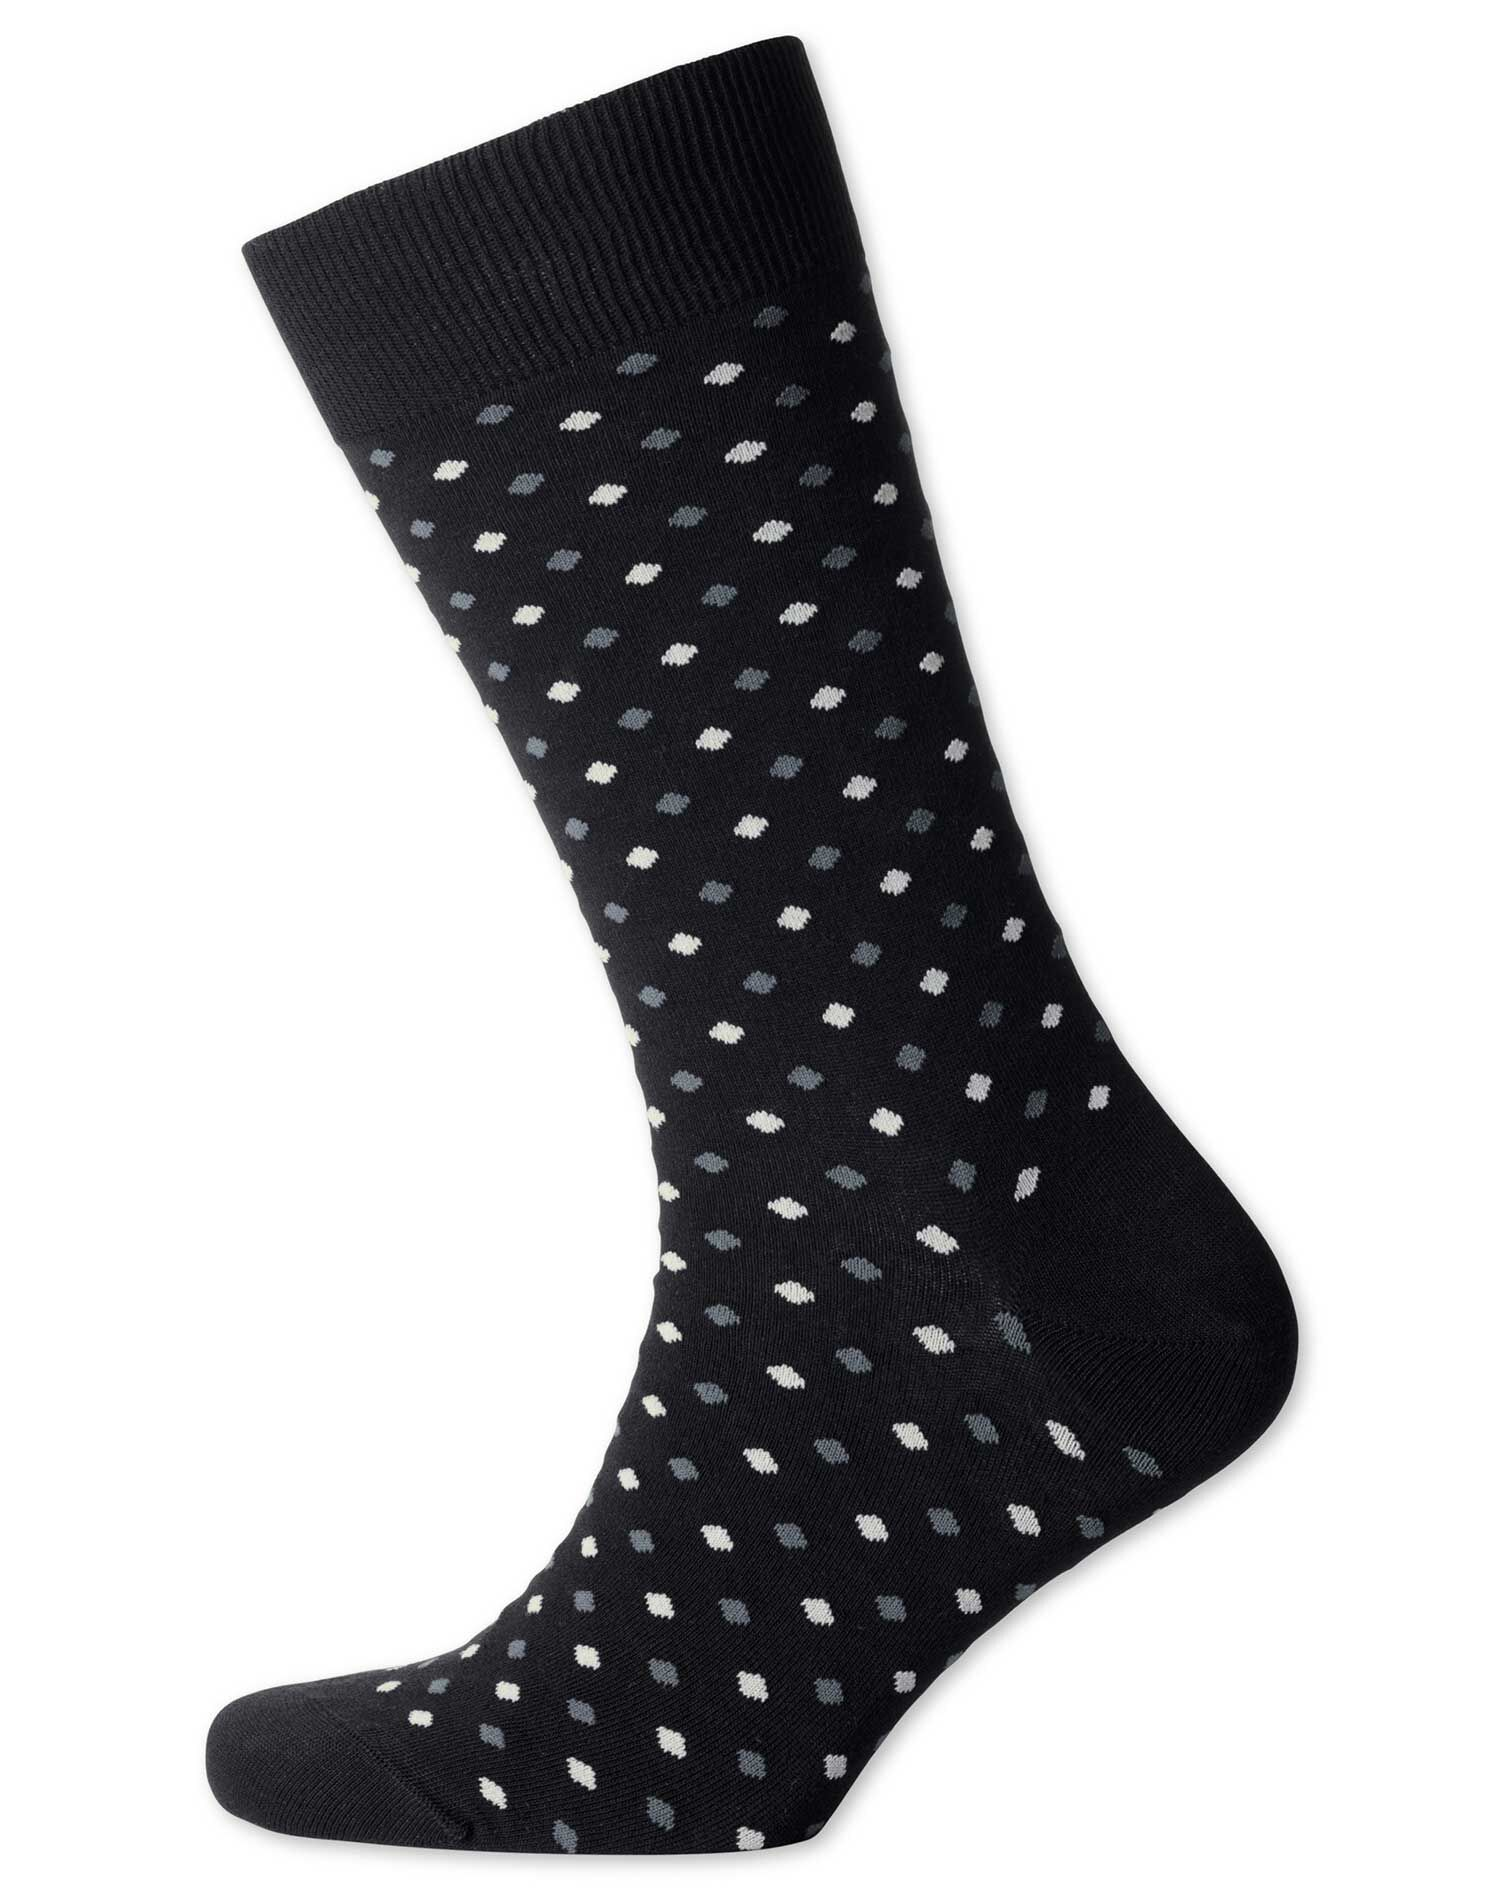 Black Small Spot Socks Size Medium by Charles Tyrwhitt